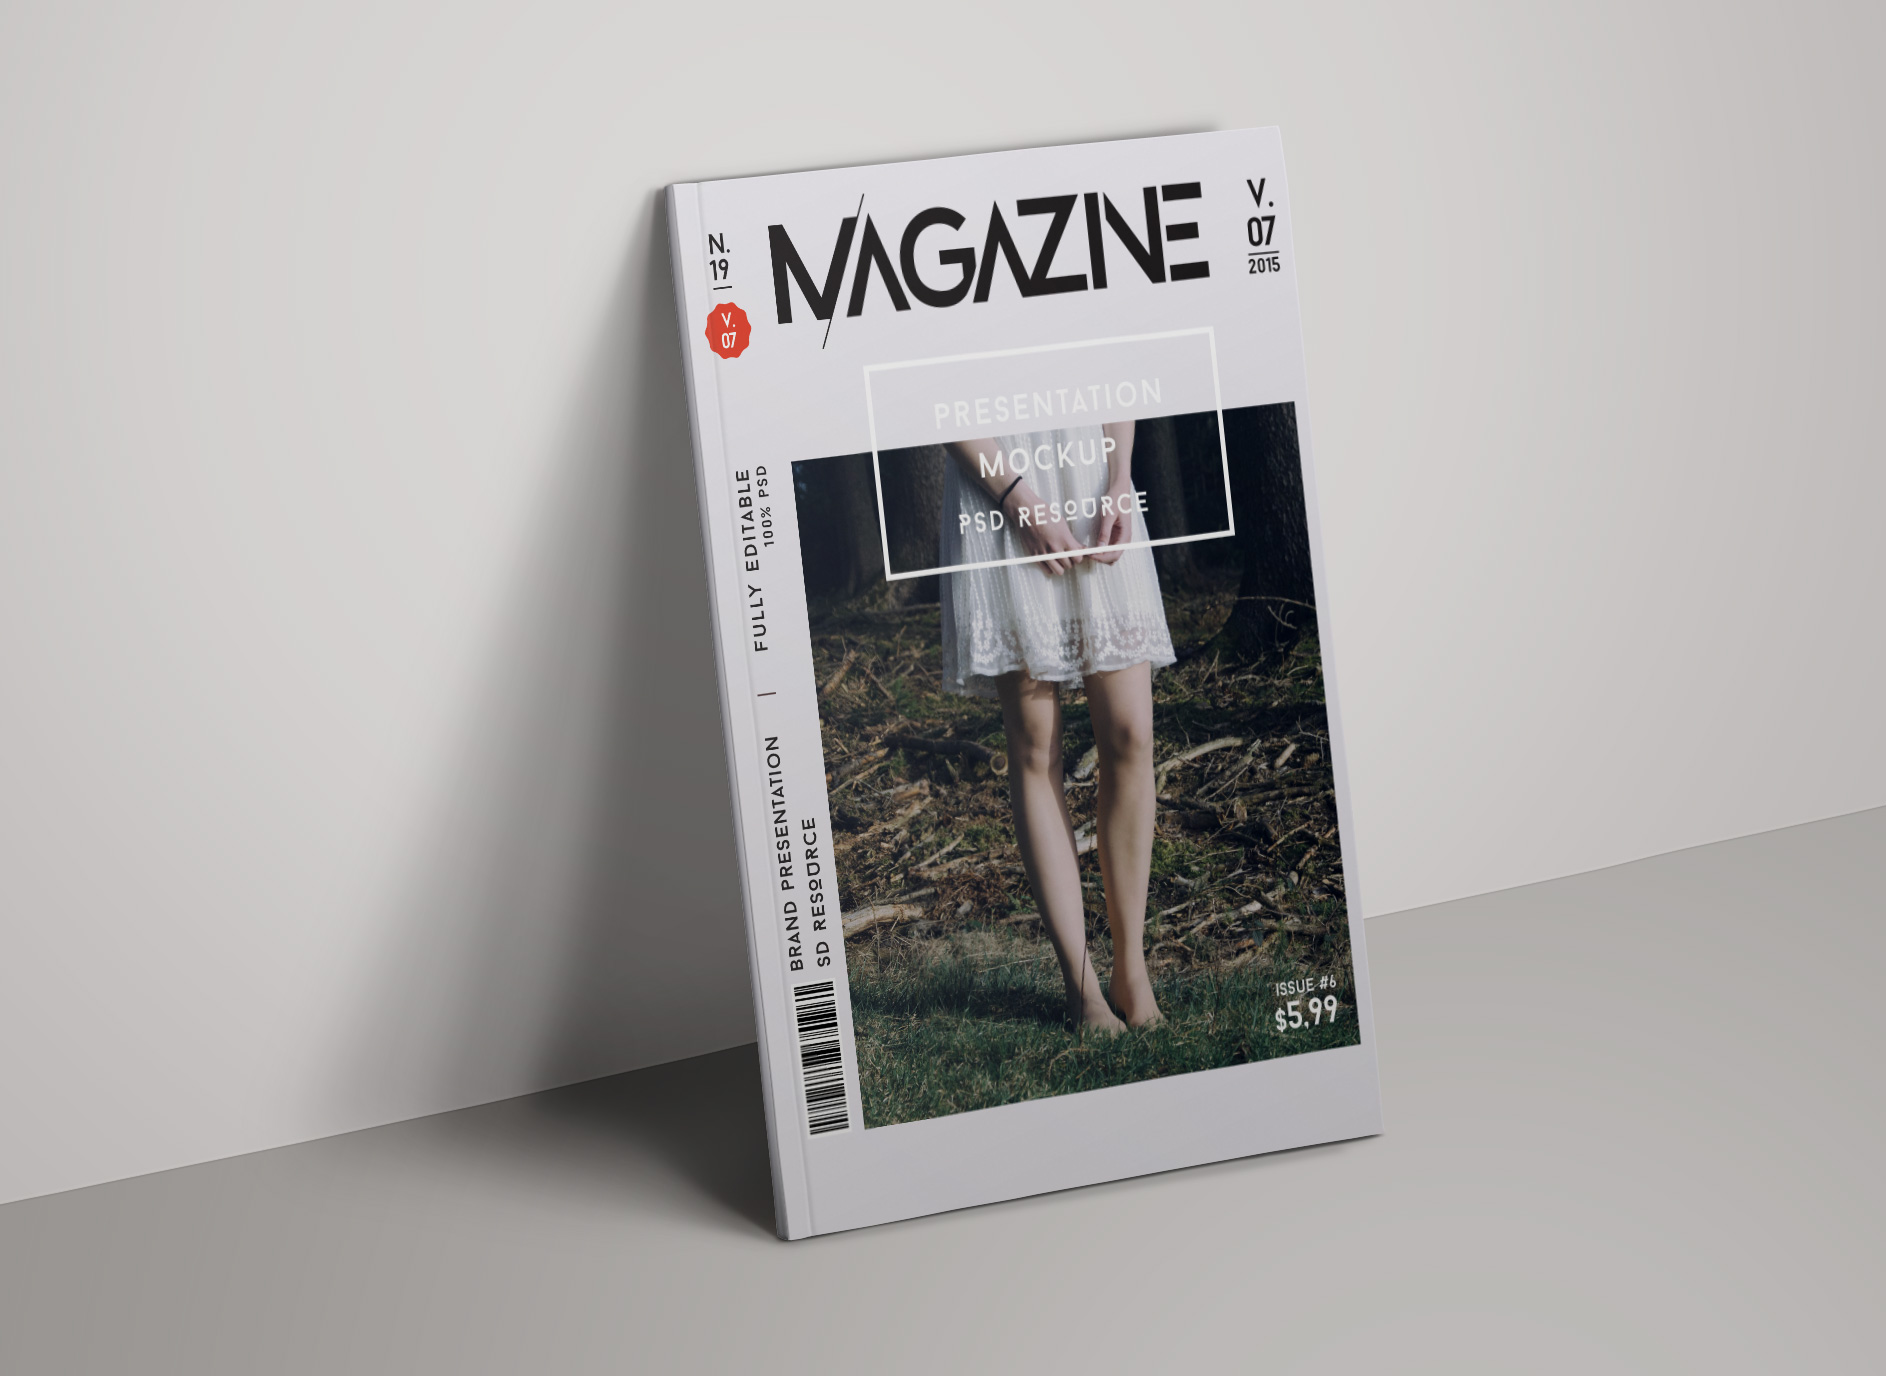 magazine-cover-mockup-presentation